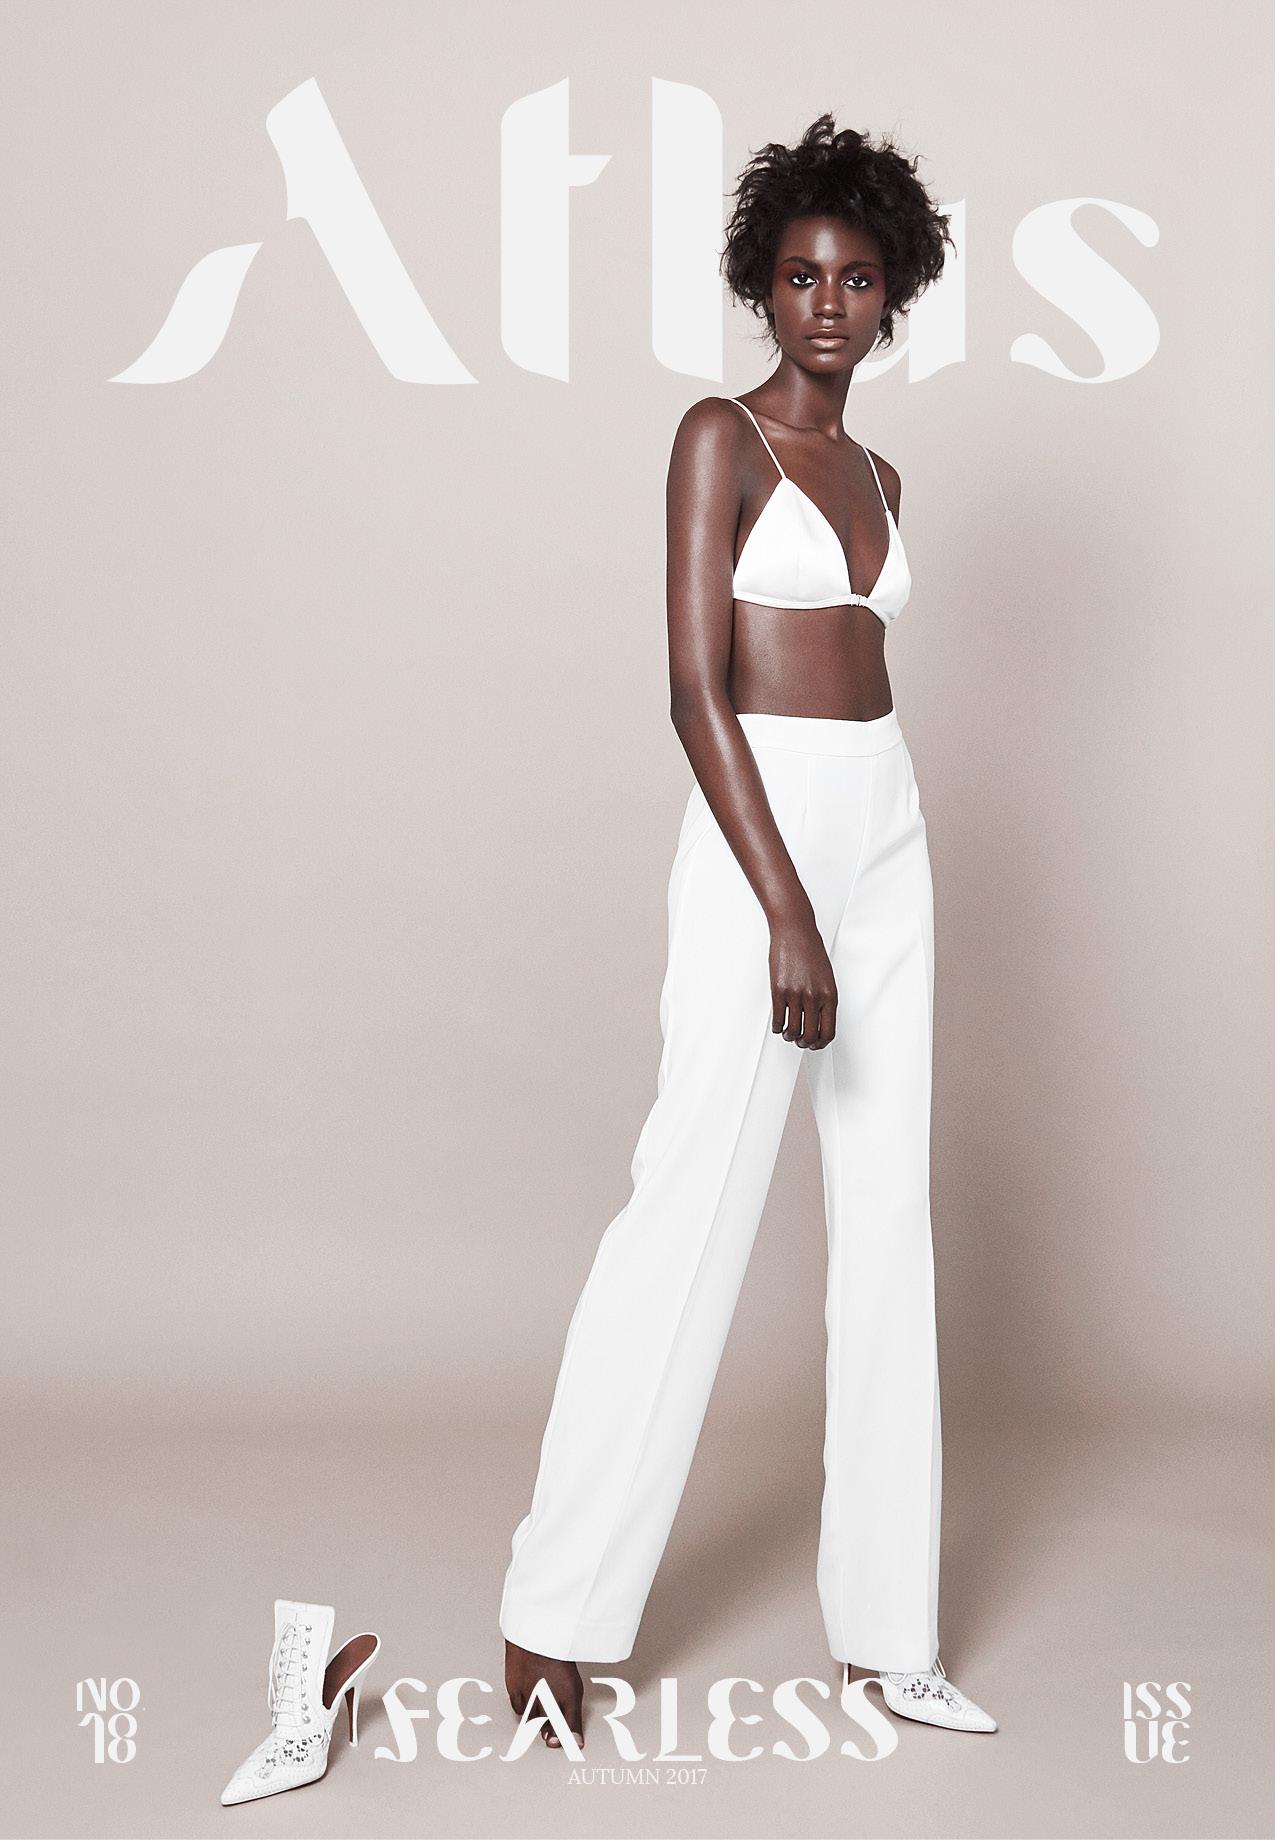 Fearless Issue - Atarah Atkinson - Cover.jpg